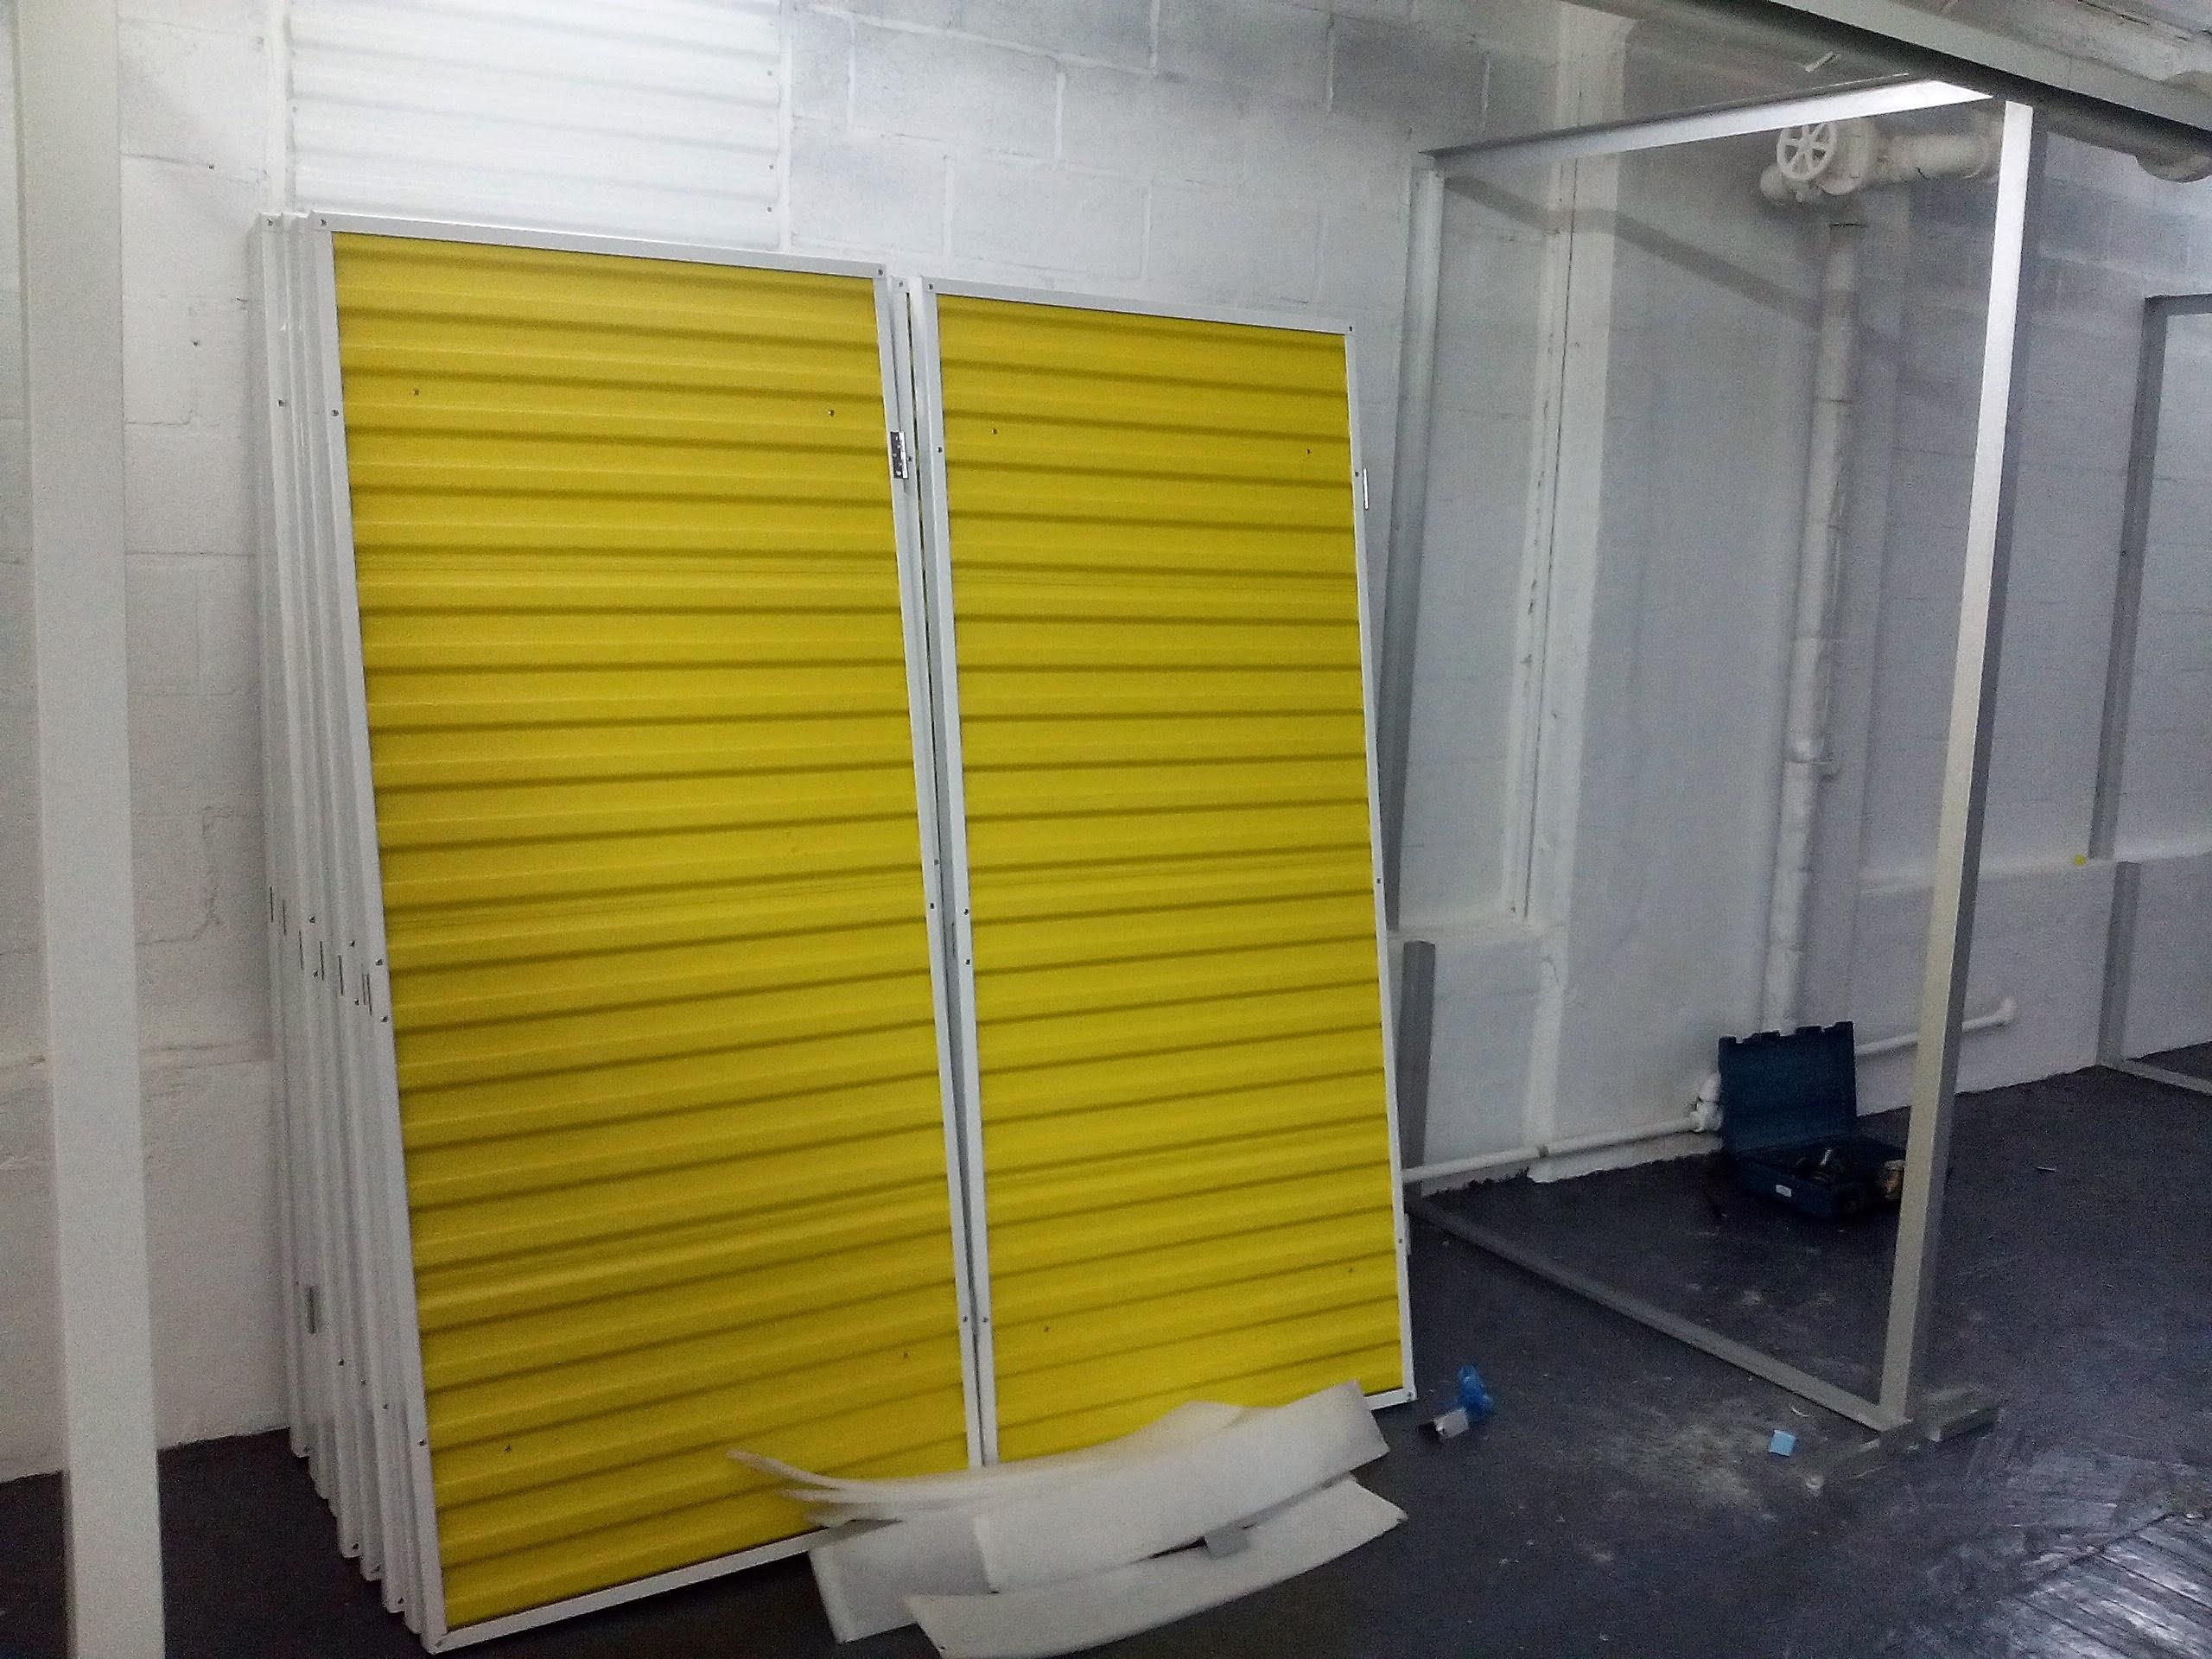 Progress On Building More Storage Units Bronx Ny Mini & Storage Units Nyc - Listitdallas